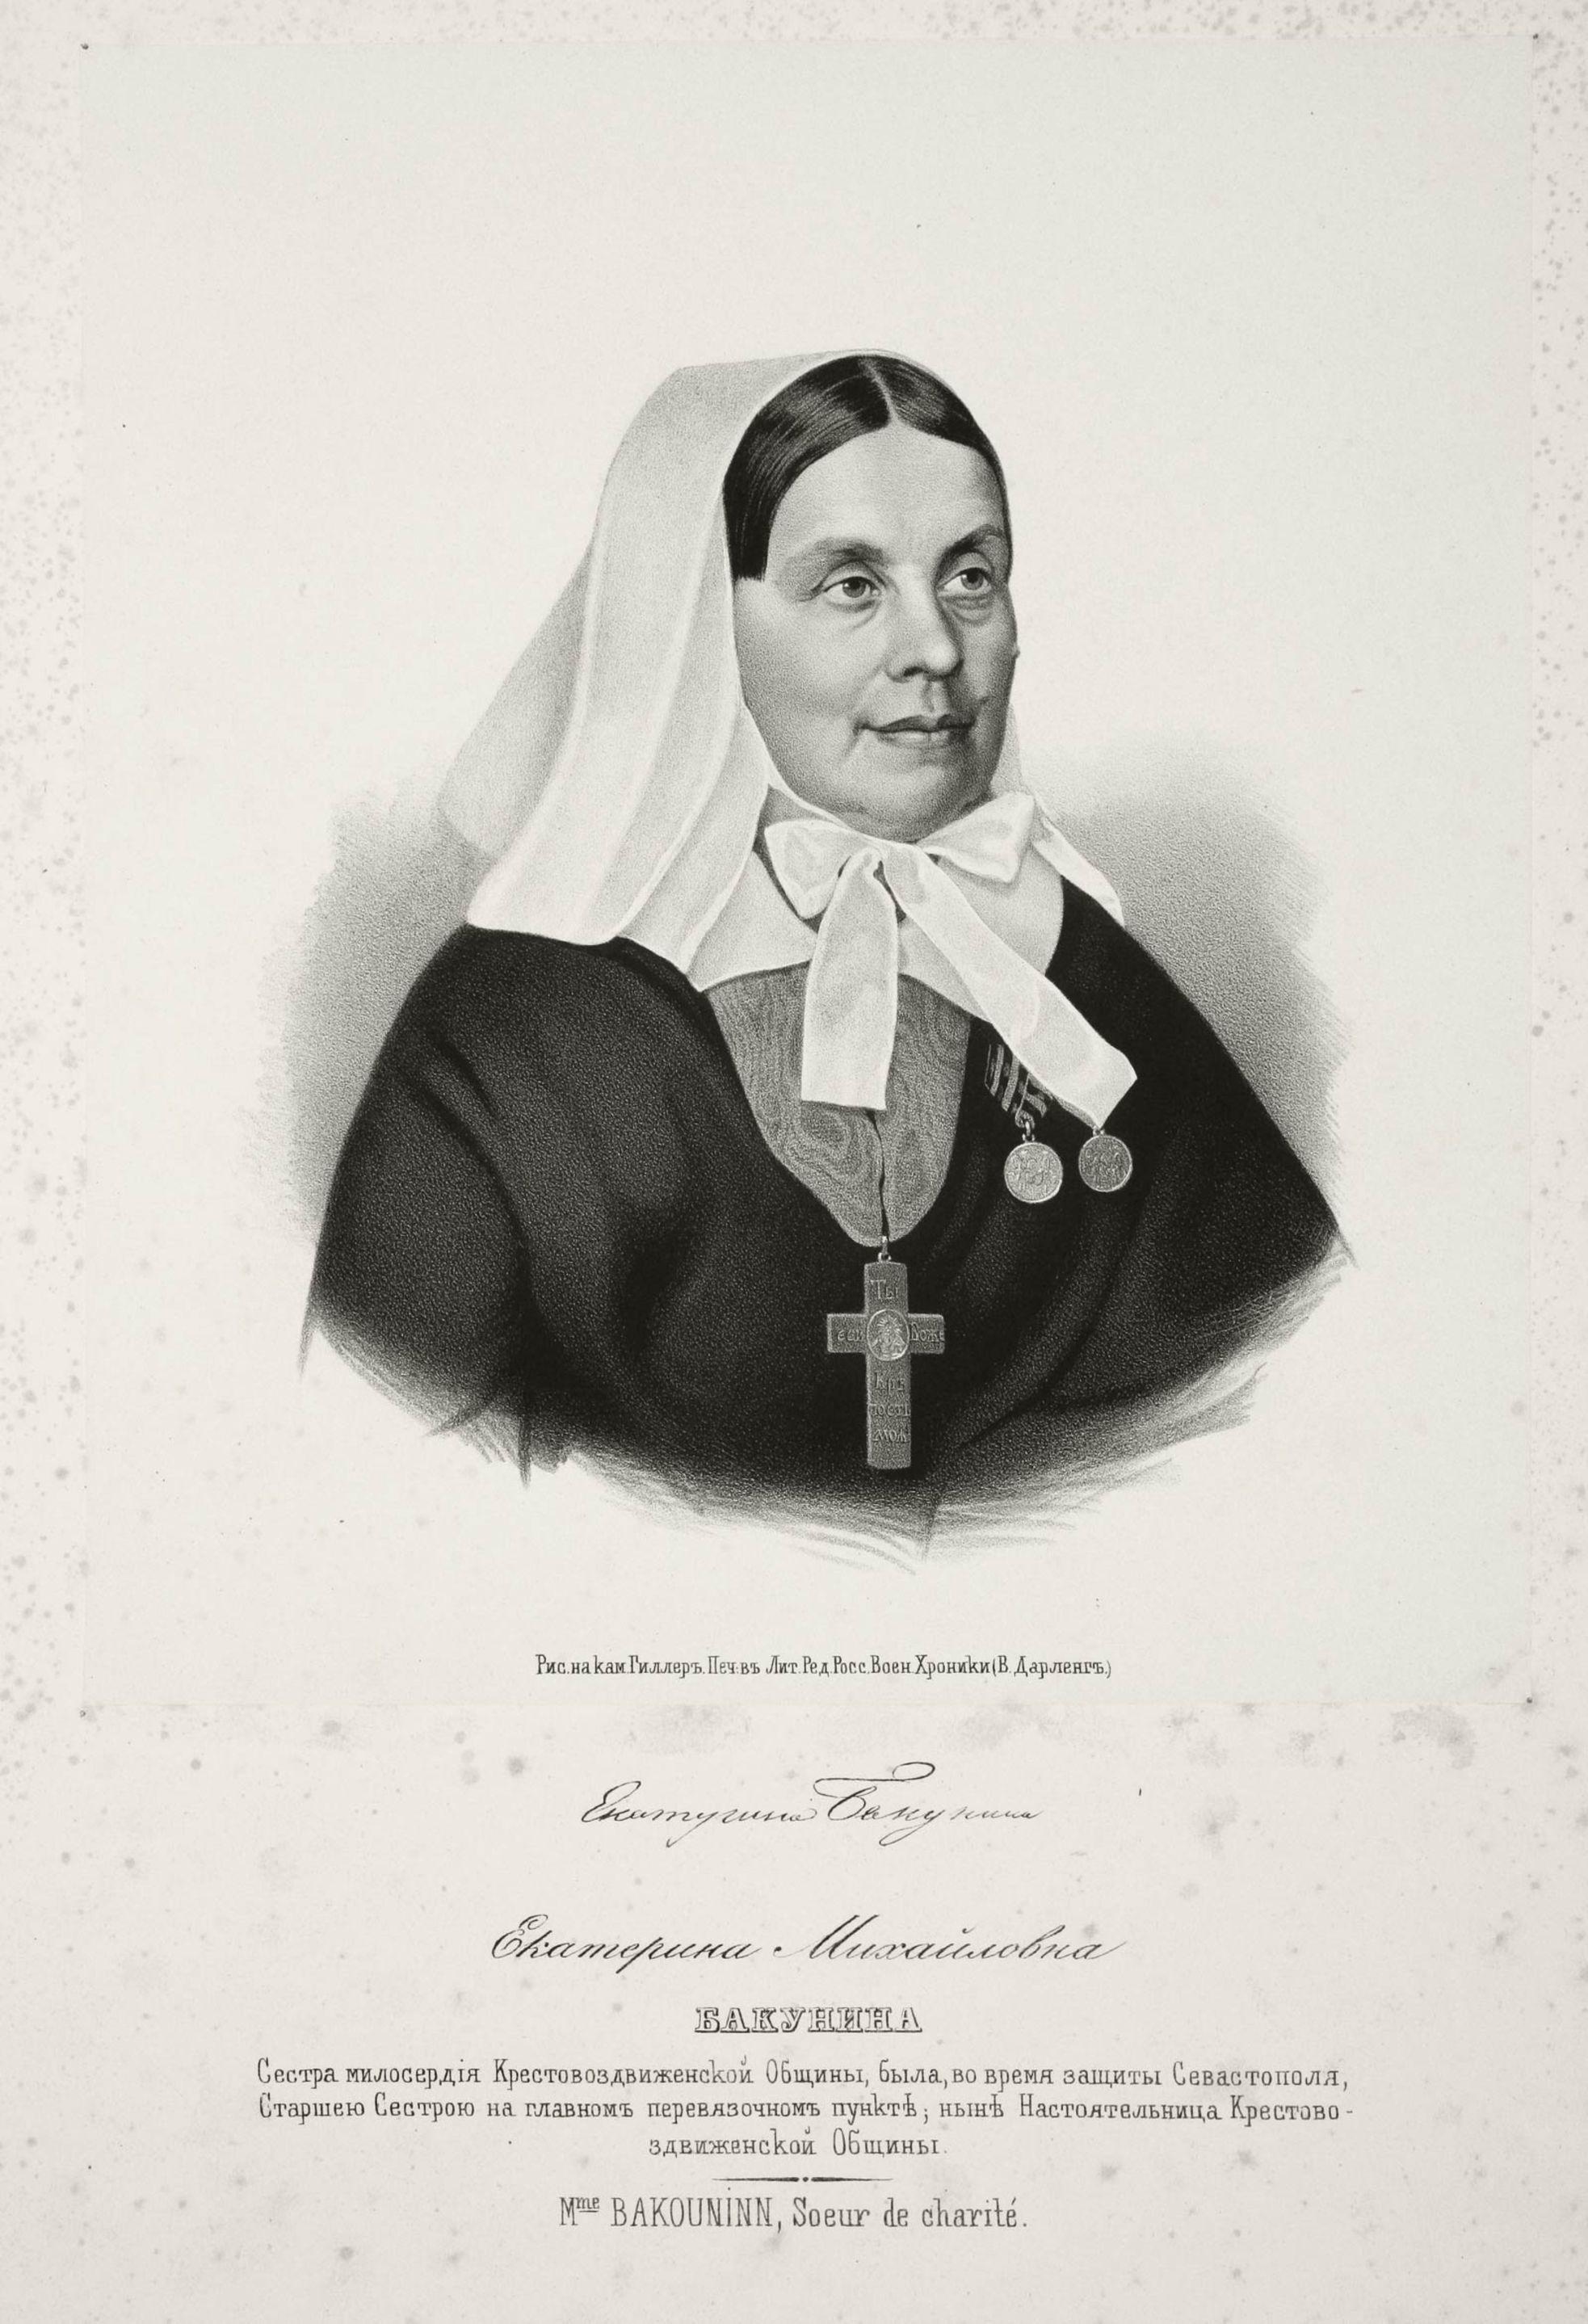 Сестра милосердия екатерина михайловна бакунина реферат 552